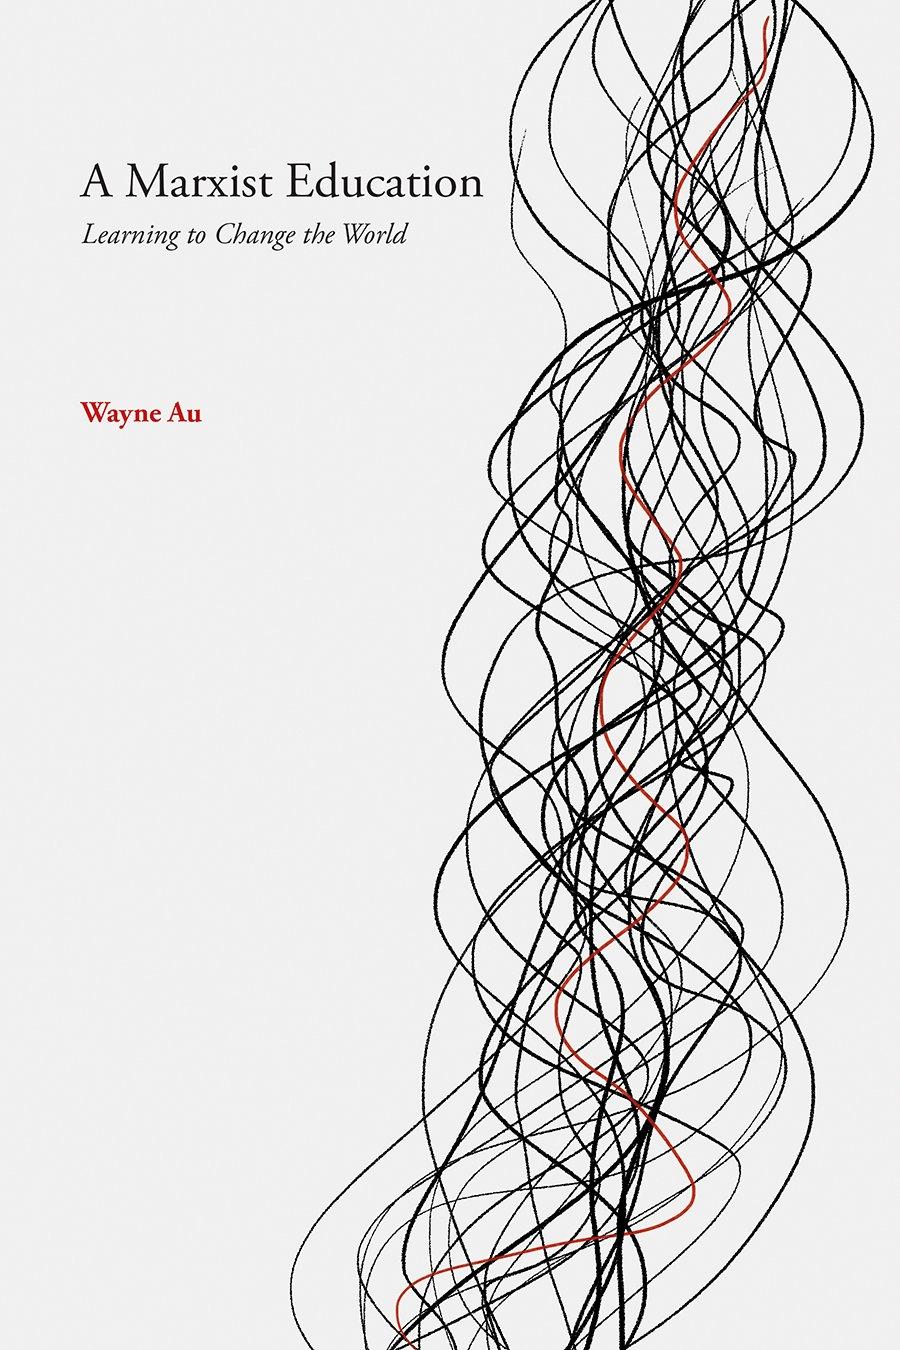 A Deeper Critical Consciousness: An Interview with Wayne